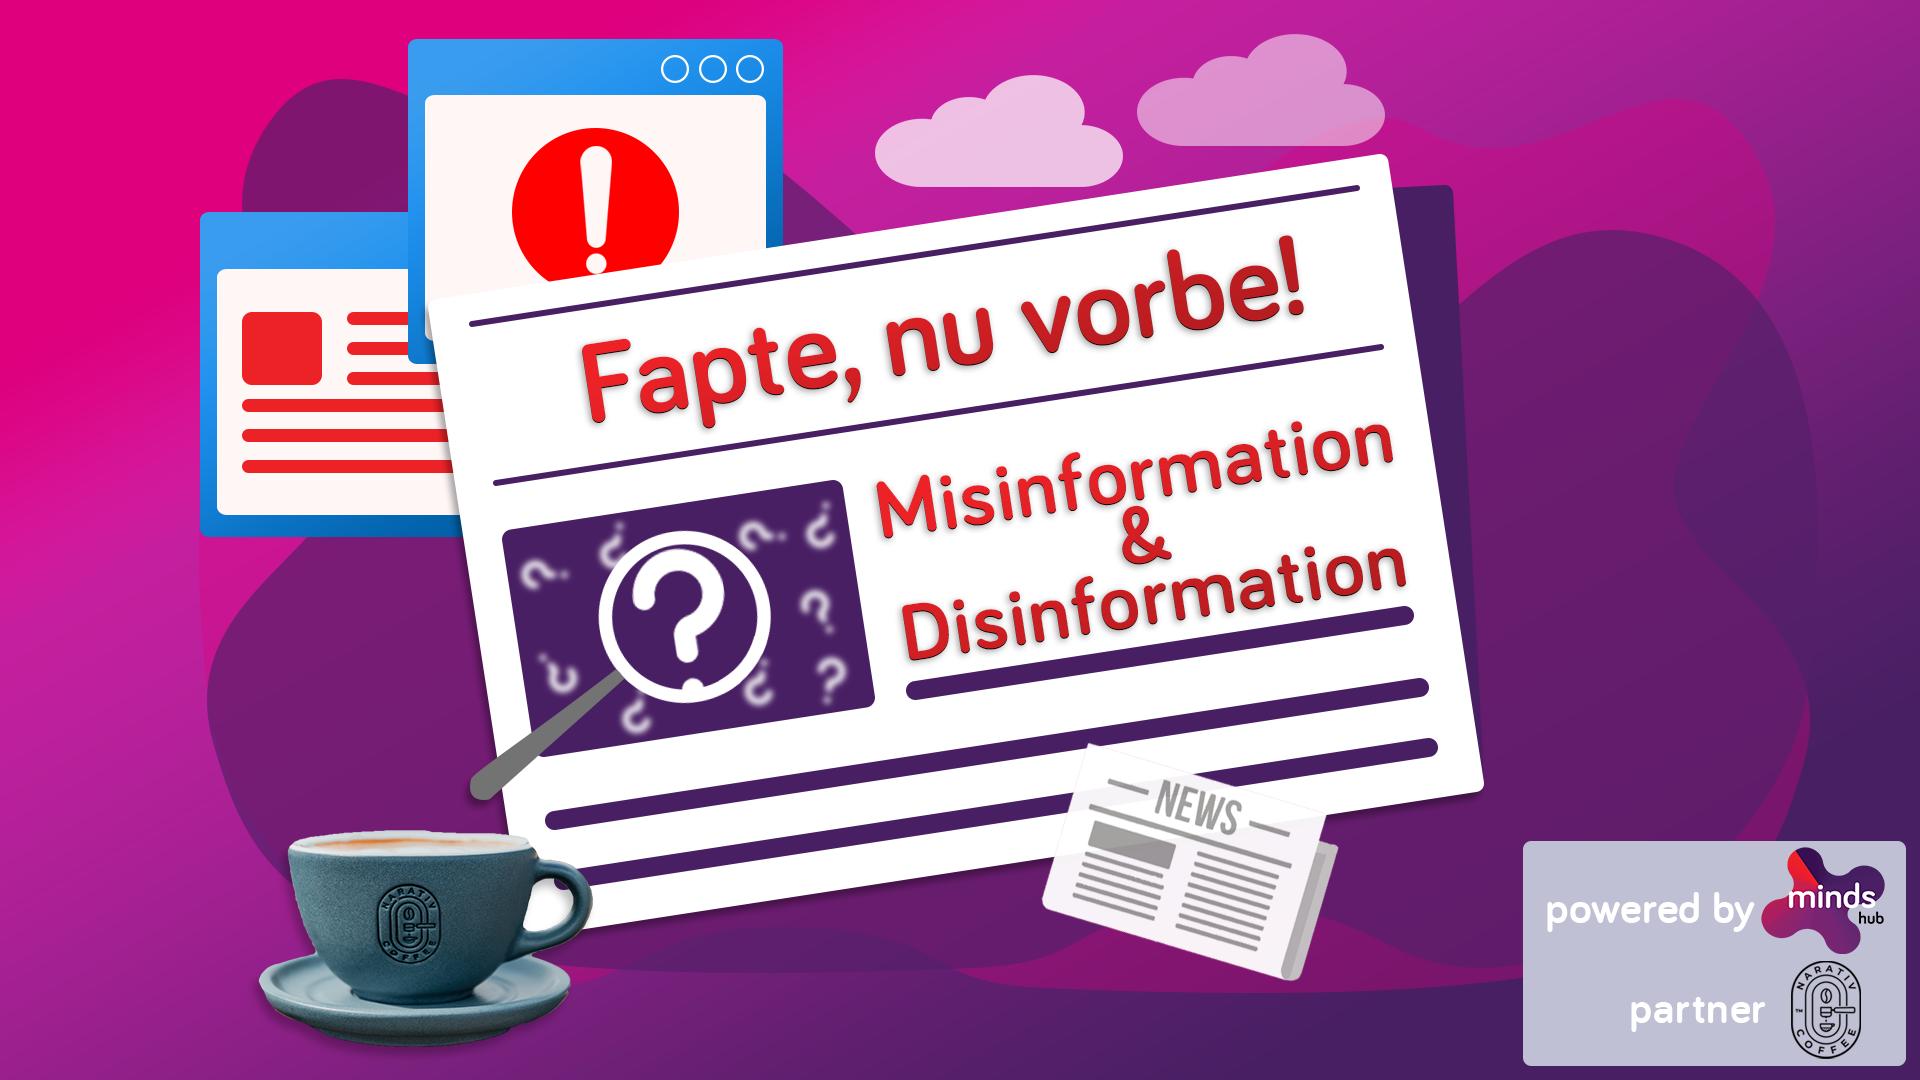 Fake news – Capitolul 1. Fapte, nu vorbe! Partea 2: Misinformation & Disinformation